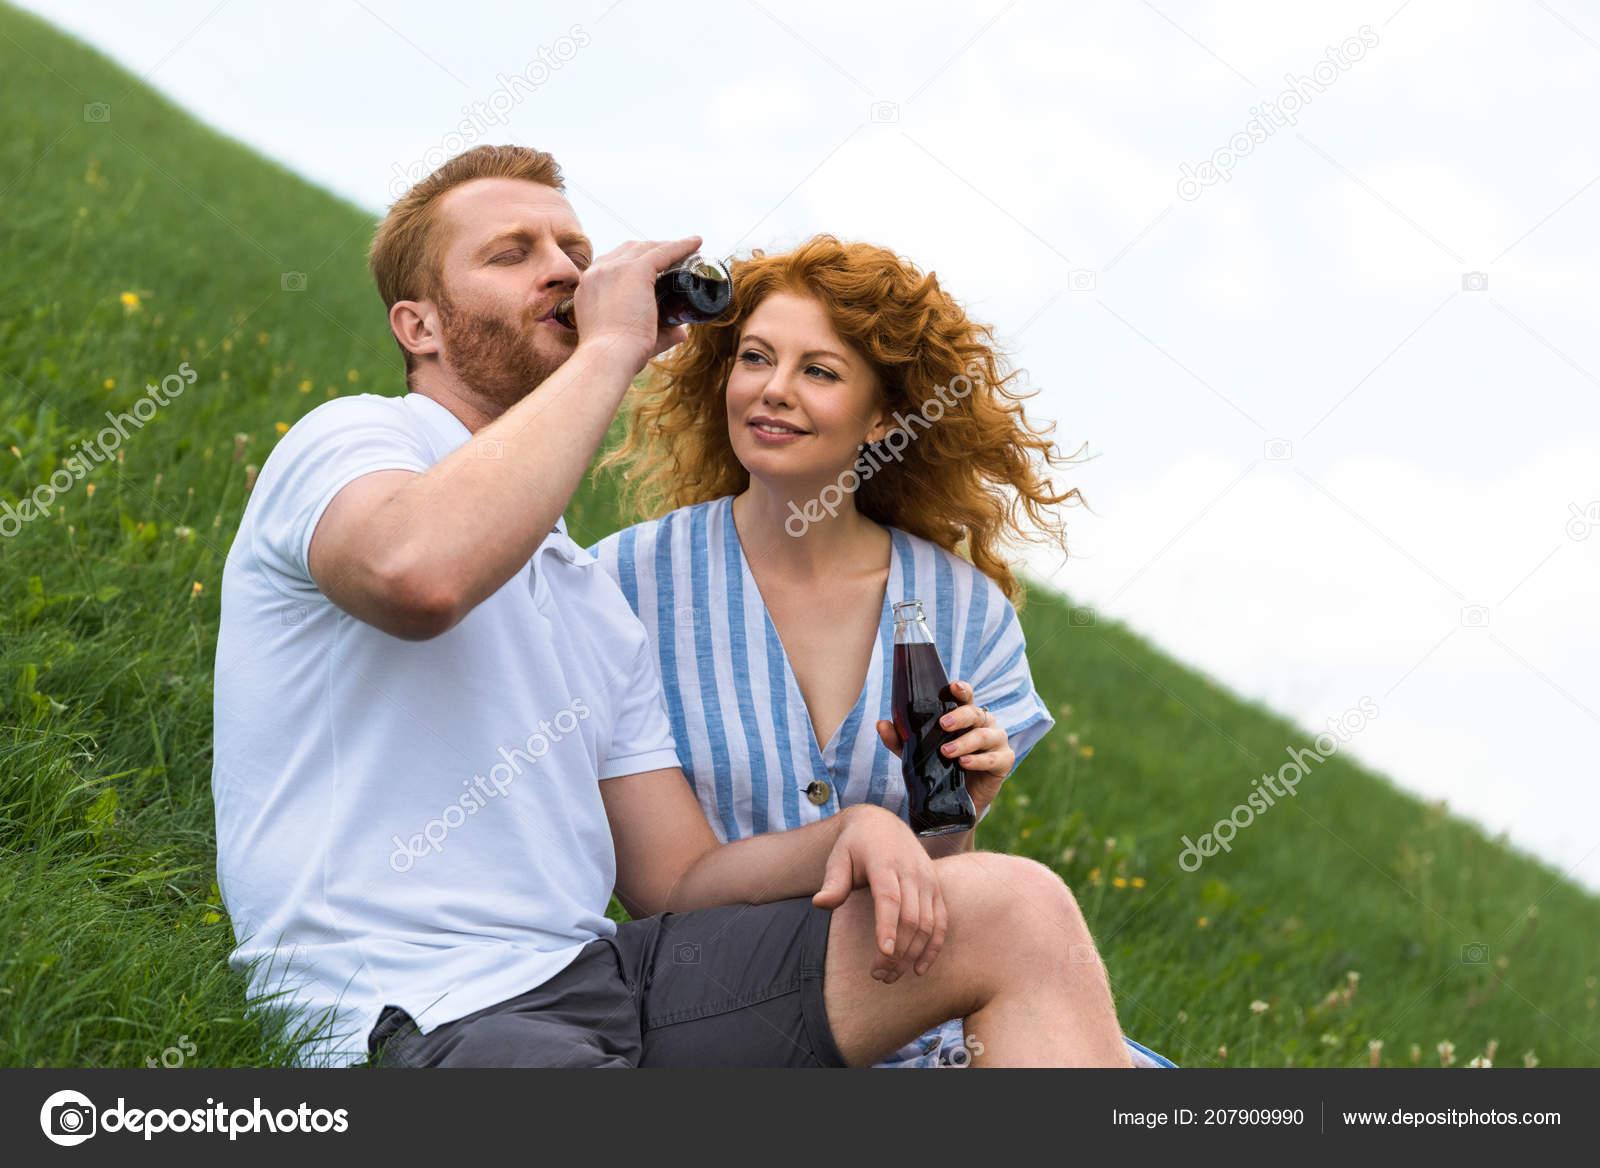 y combinatie dating Top Dating Sims 2014